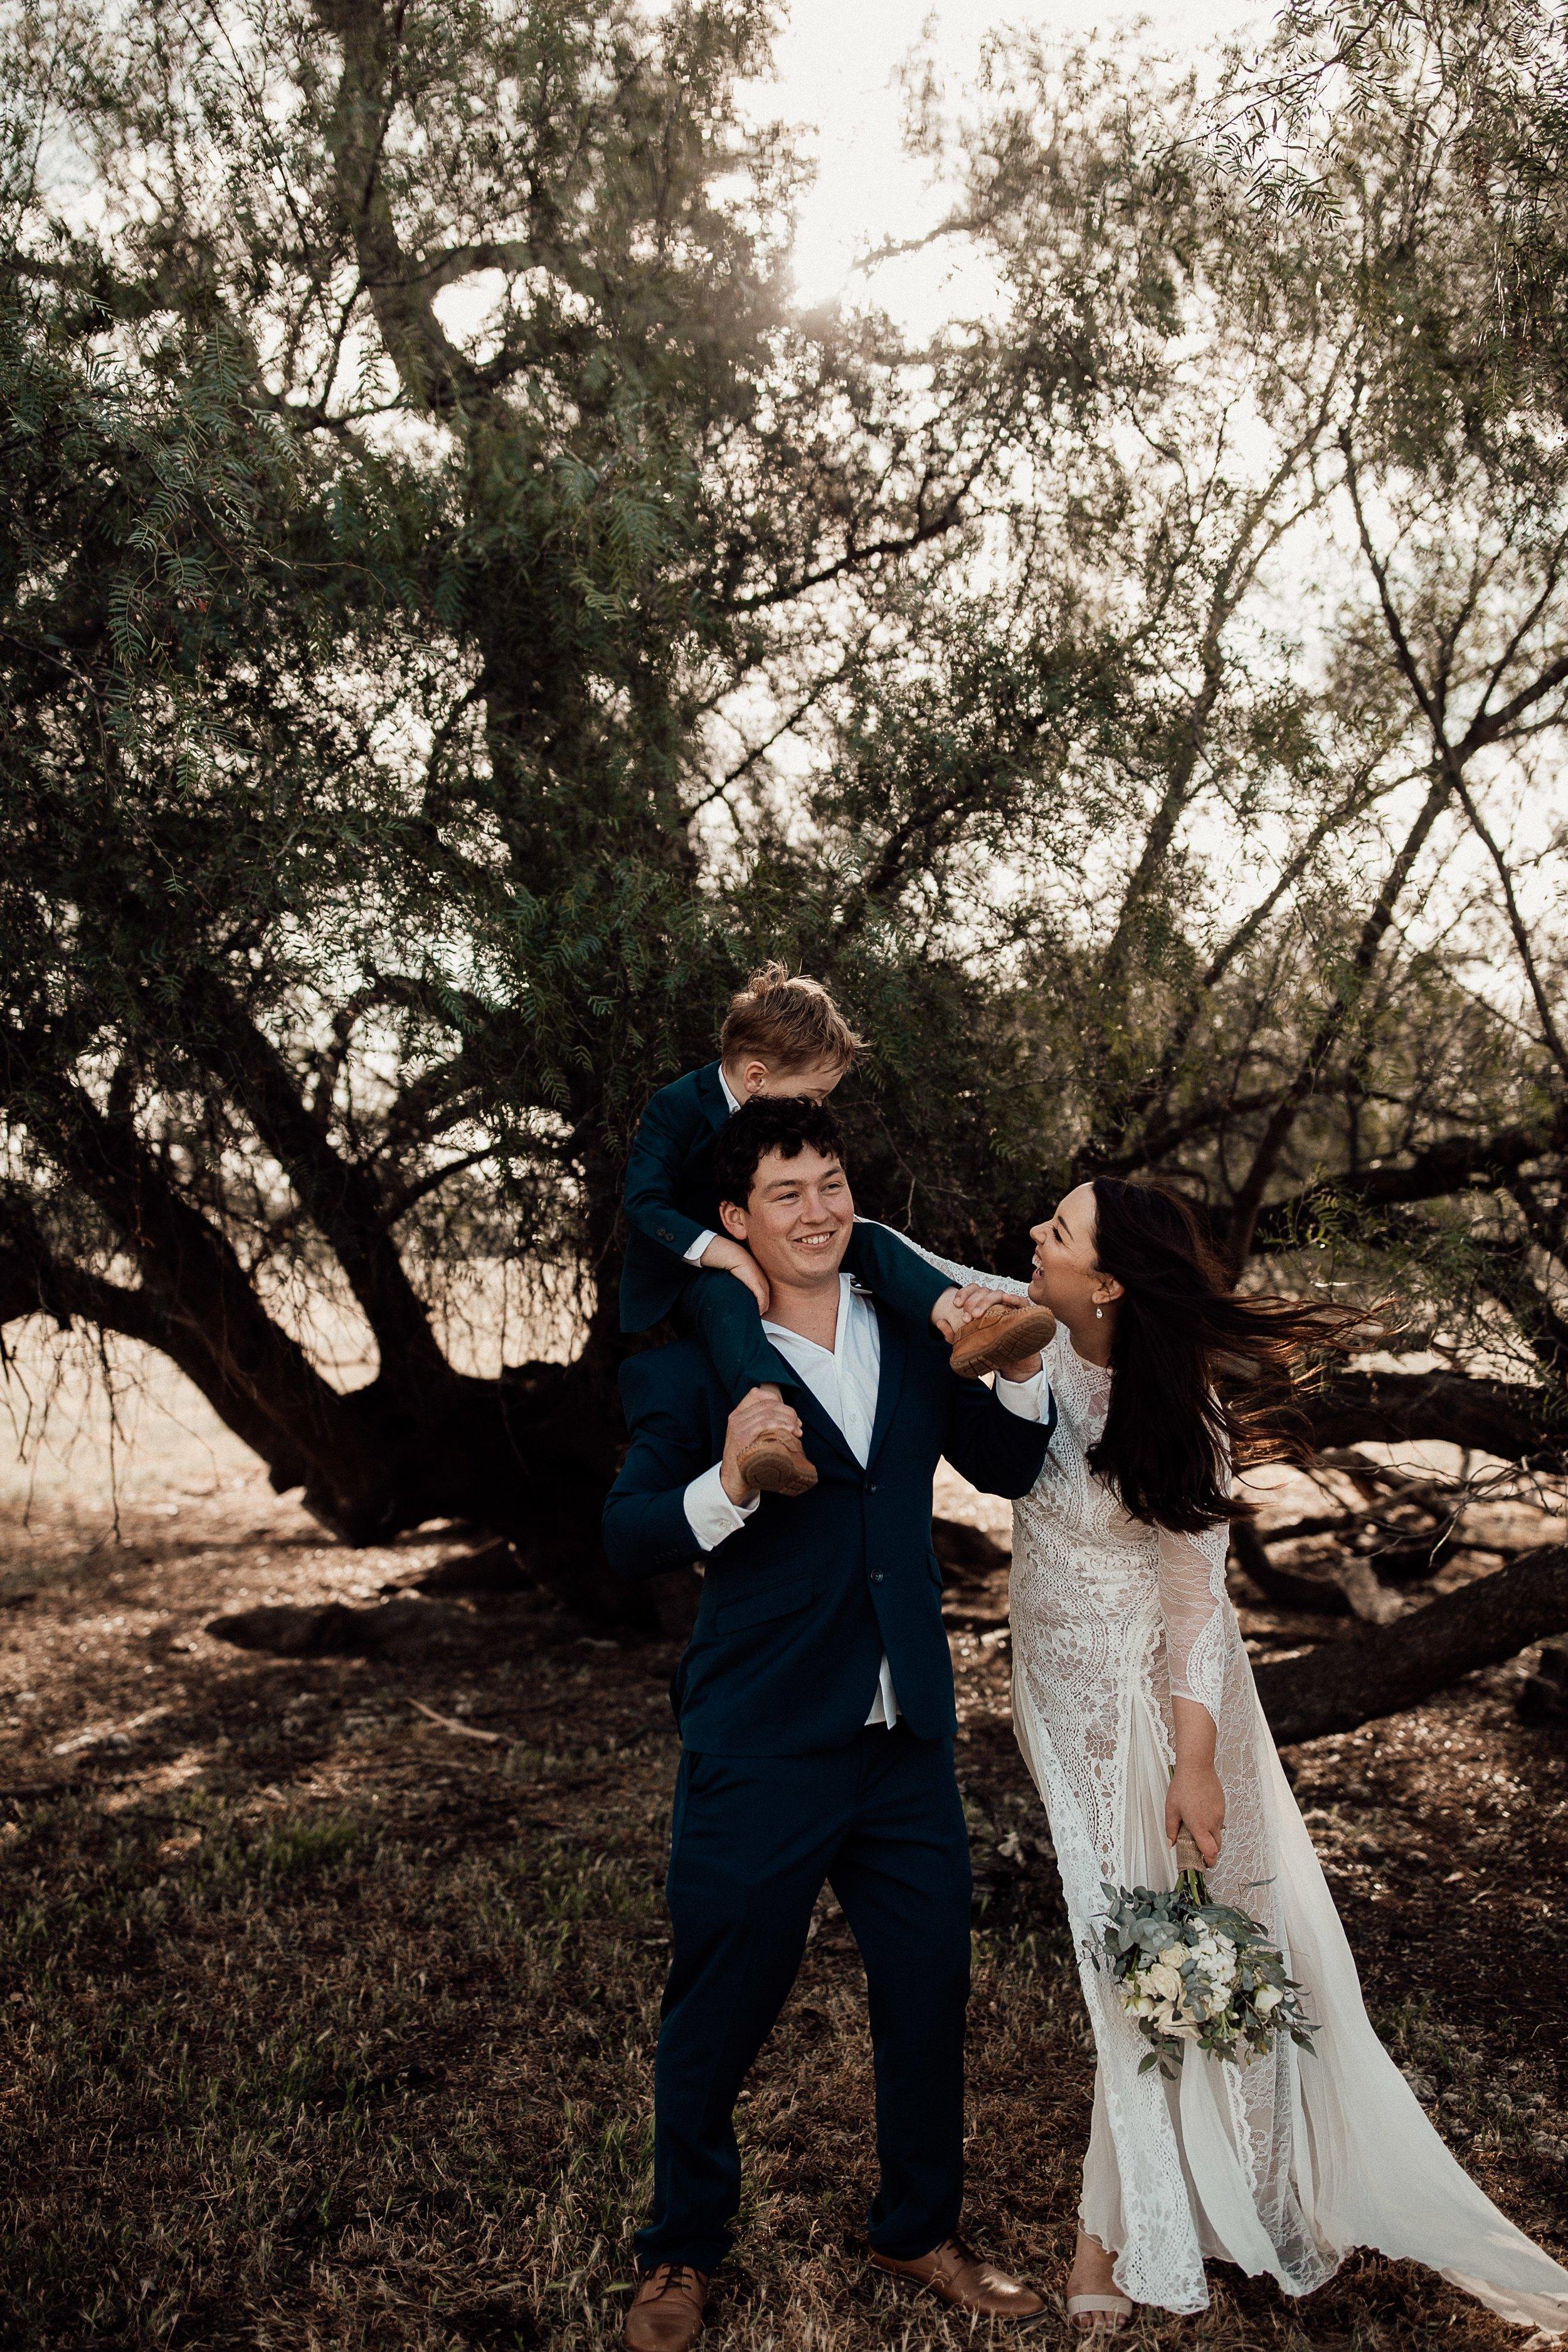 mickalathomas_puremacphotography_weddingphotographer_couplephotographer_Sheppartonphotographer_1510.jpg